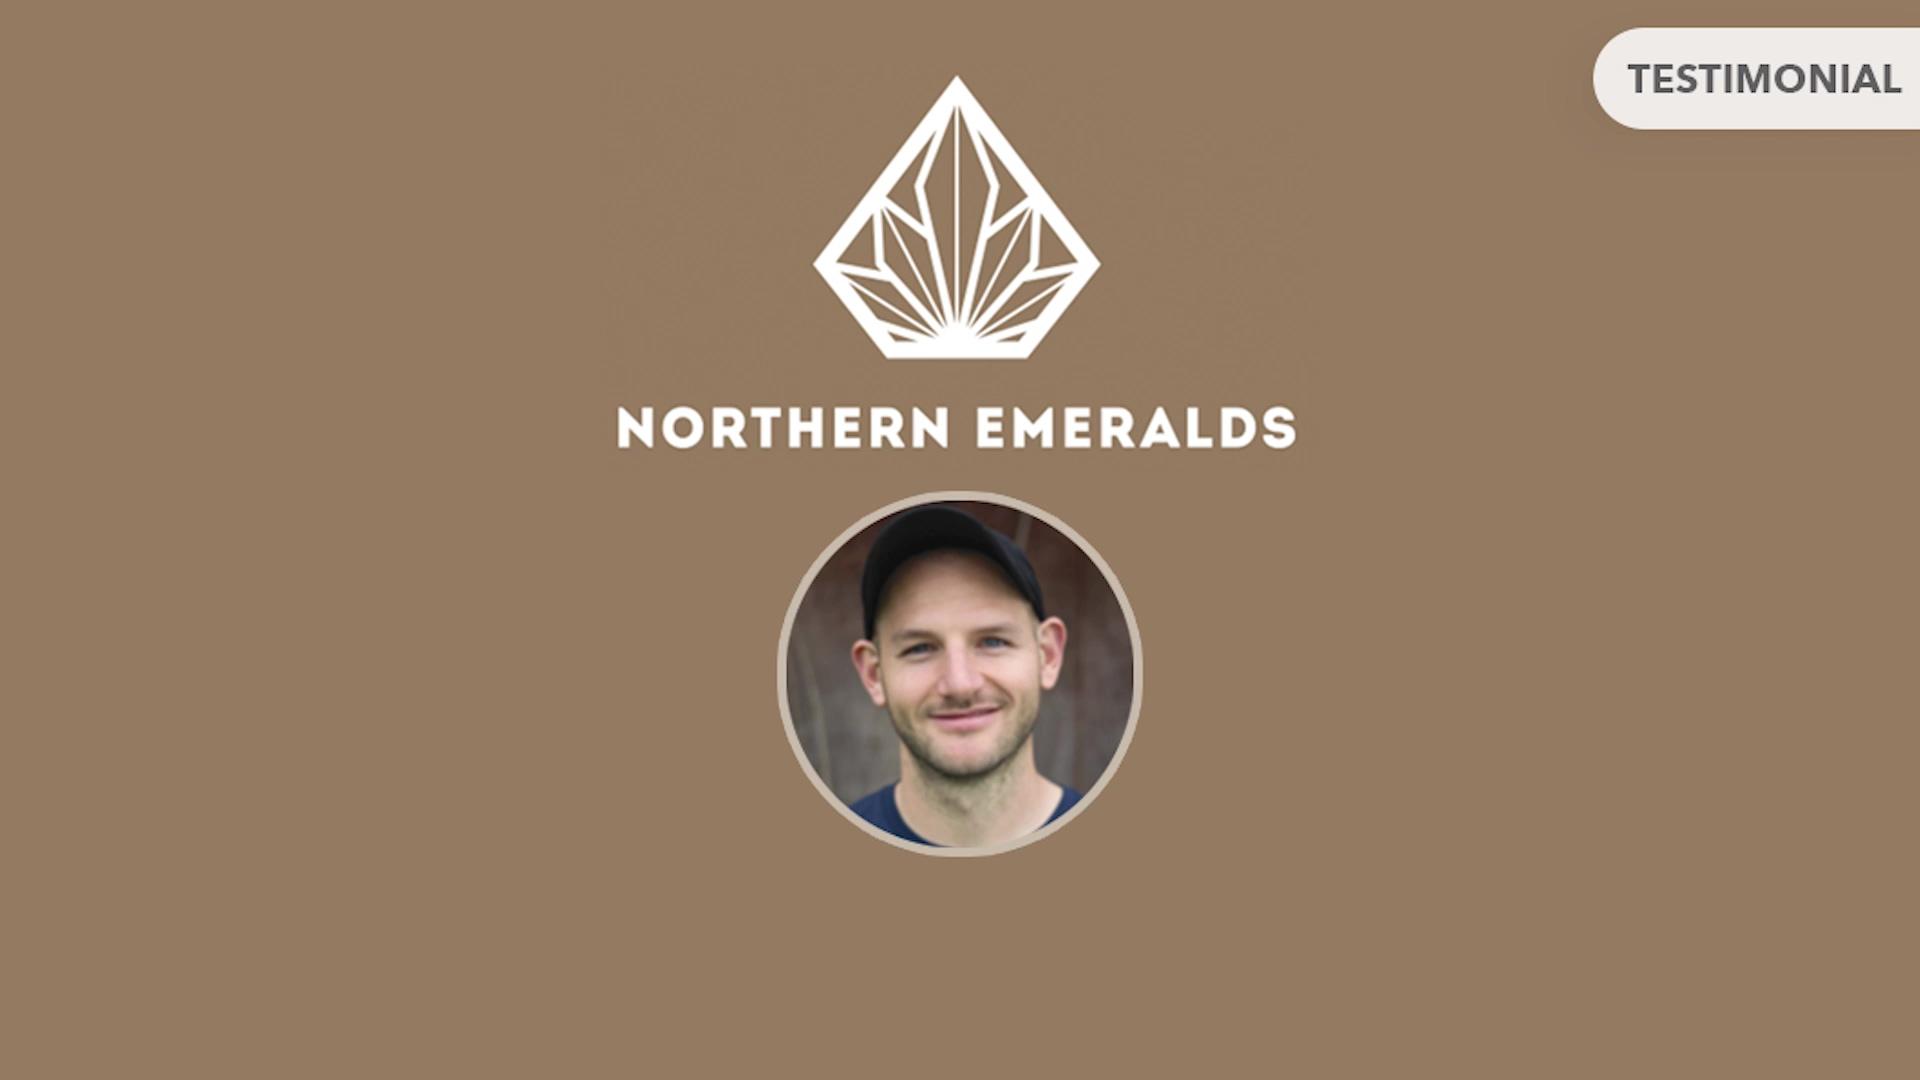 miles_northern_emerald_audio